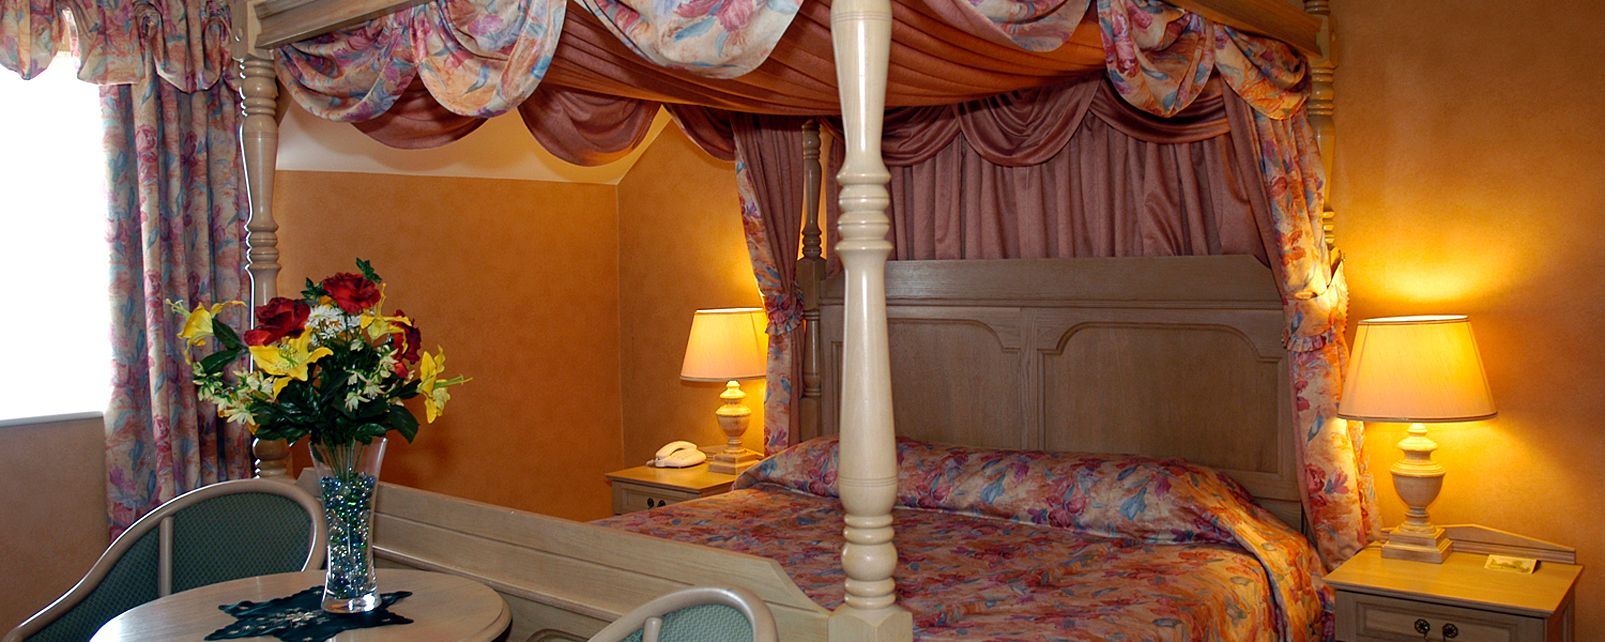 Hotel Hougue du Pommier